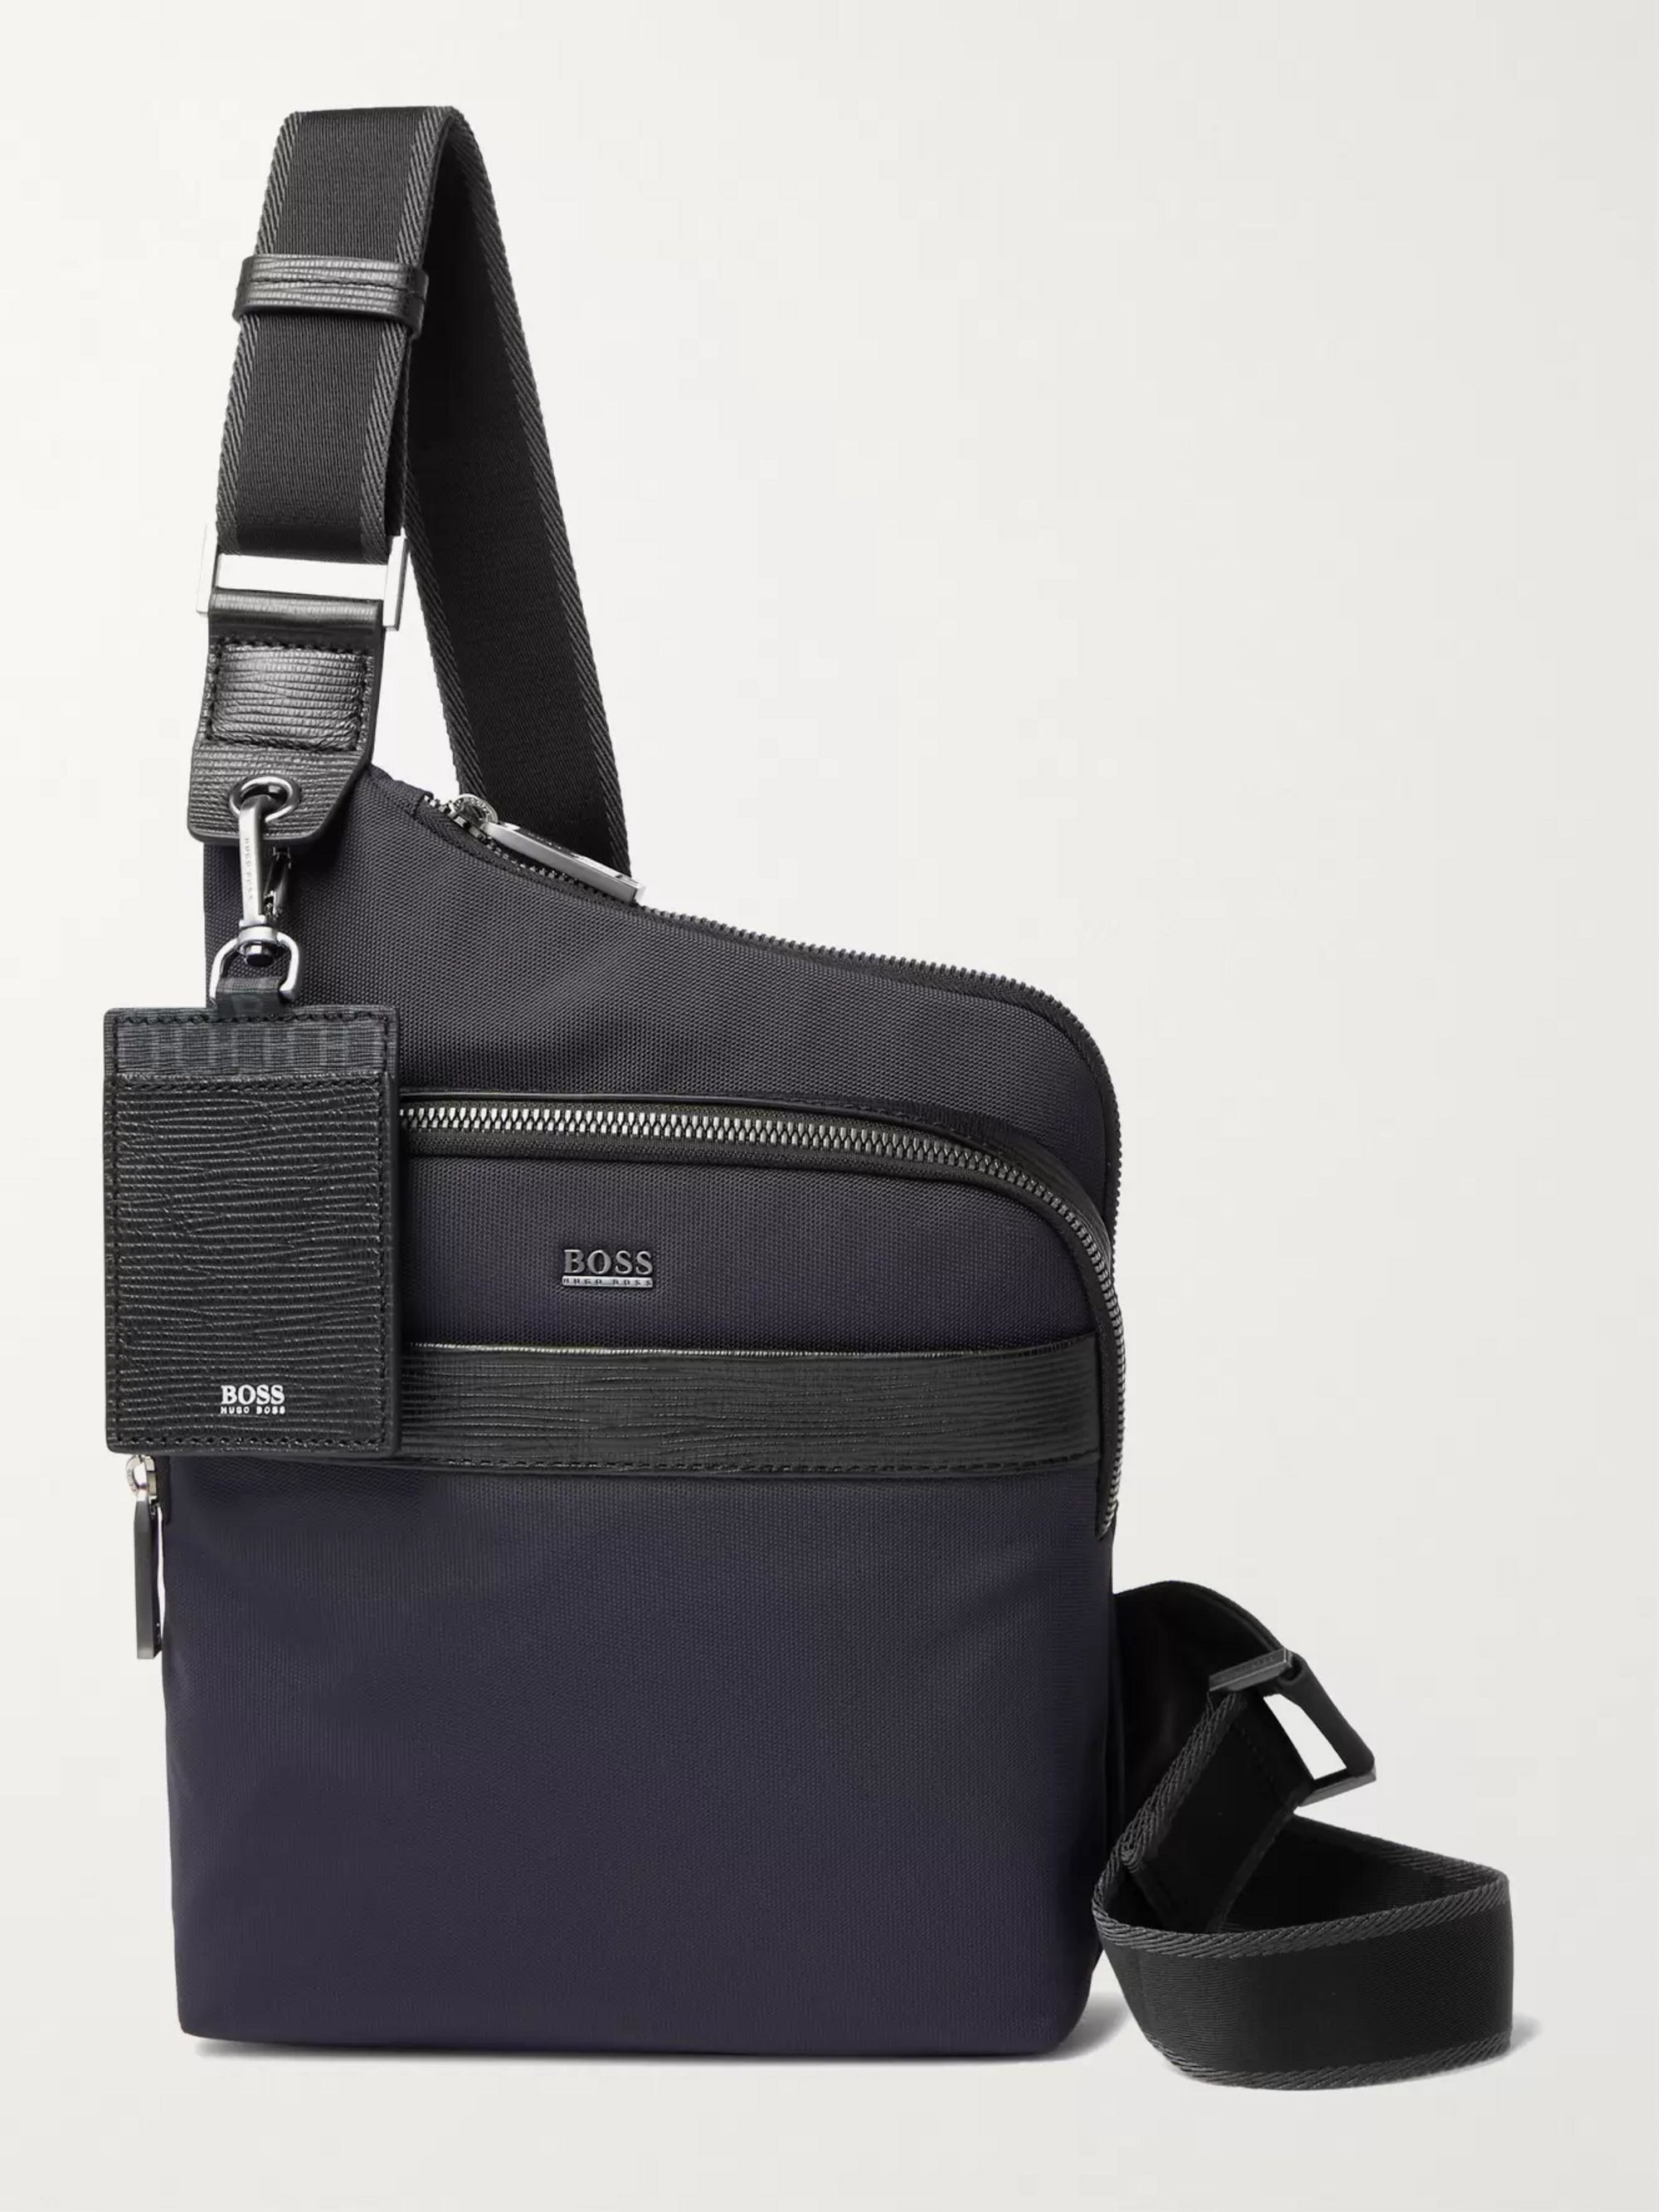 Hugo Boss Textured Leather-Trimmed Shell Messenger Bag,Blue